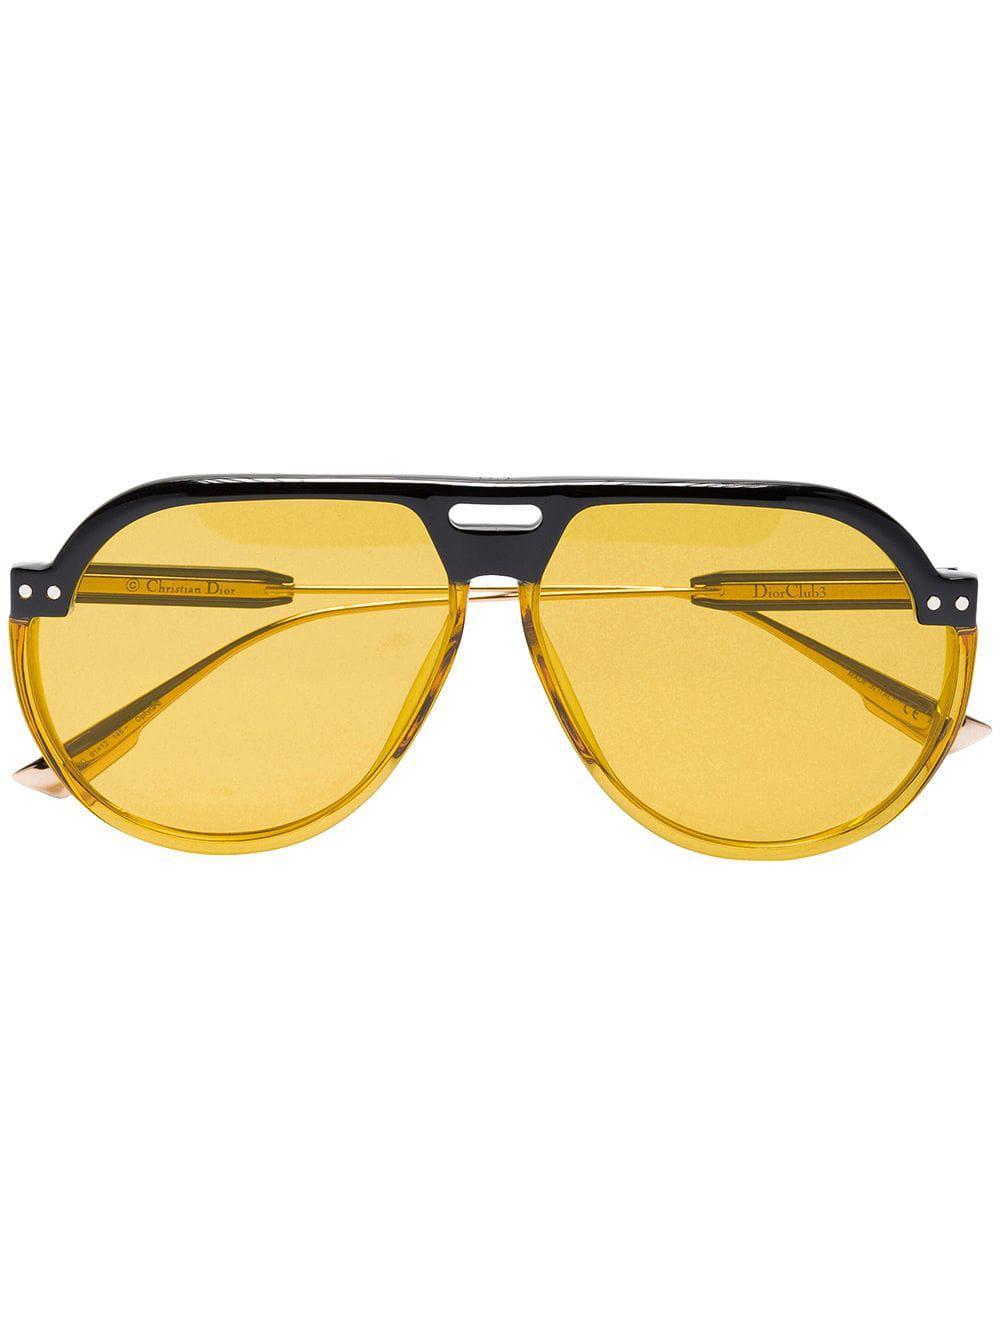 b3ffb09531 Dior Club 3 Aviator Sunglasses in Brown - Save 9% - Lyst